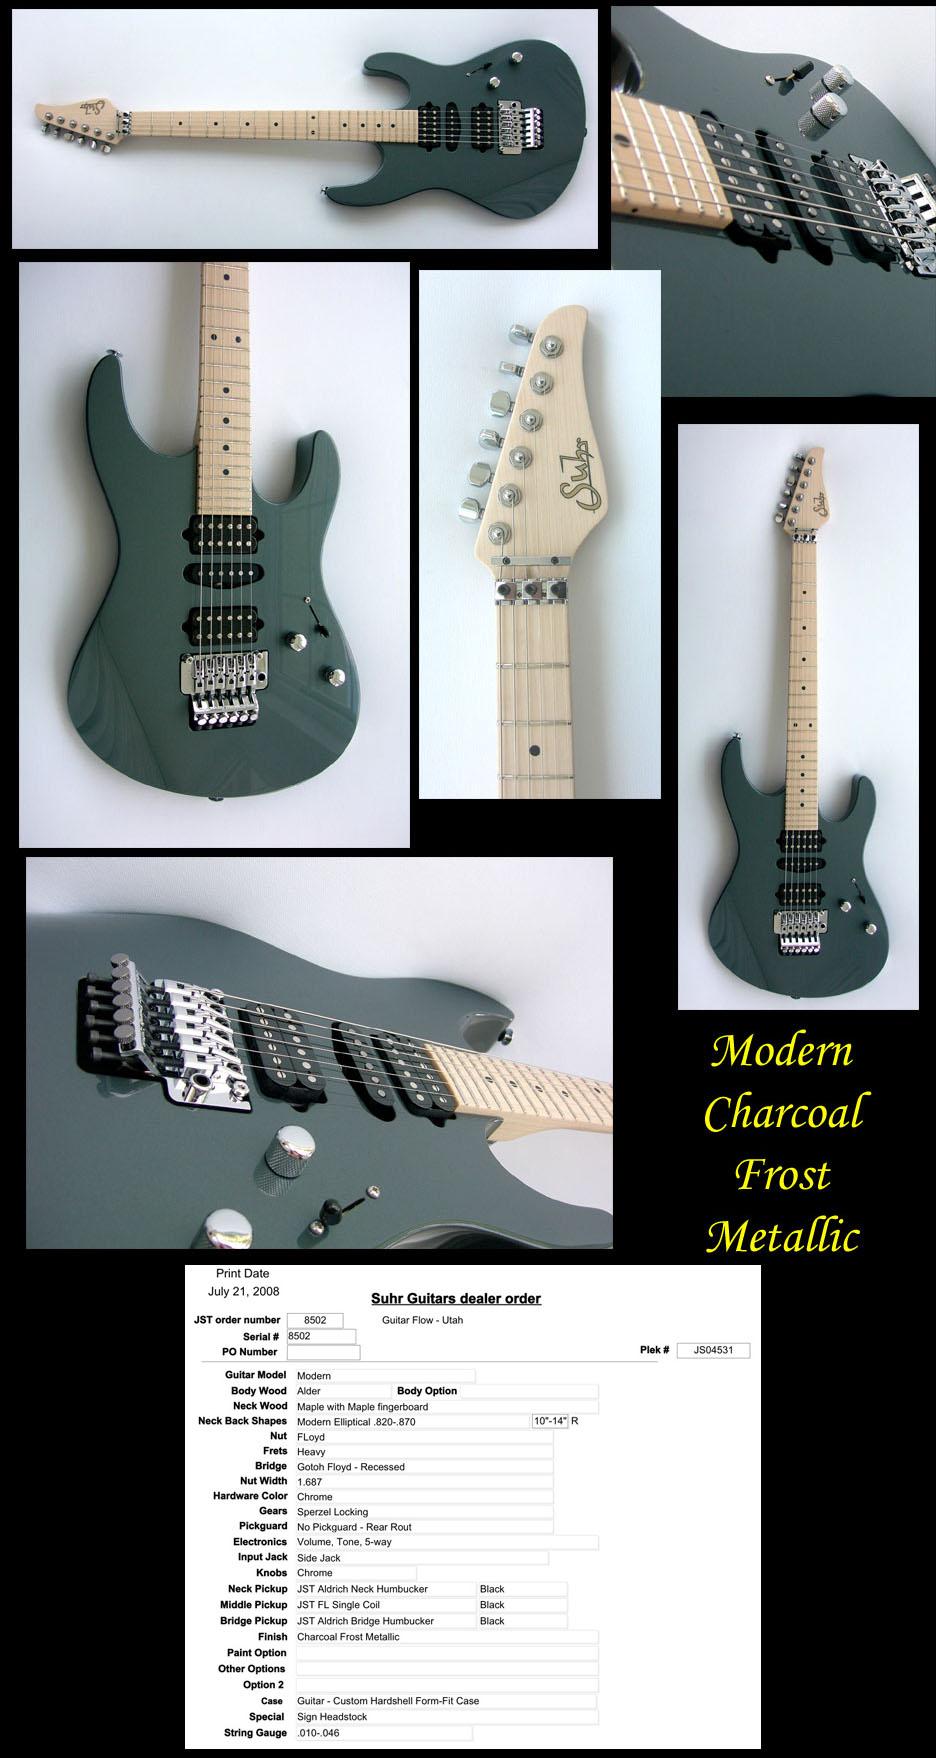 John Suhr Modern Charcoal Frost Metallic